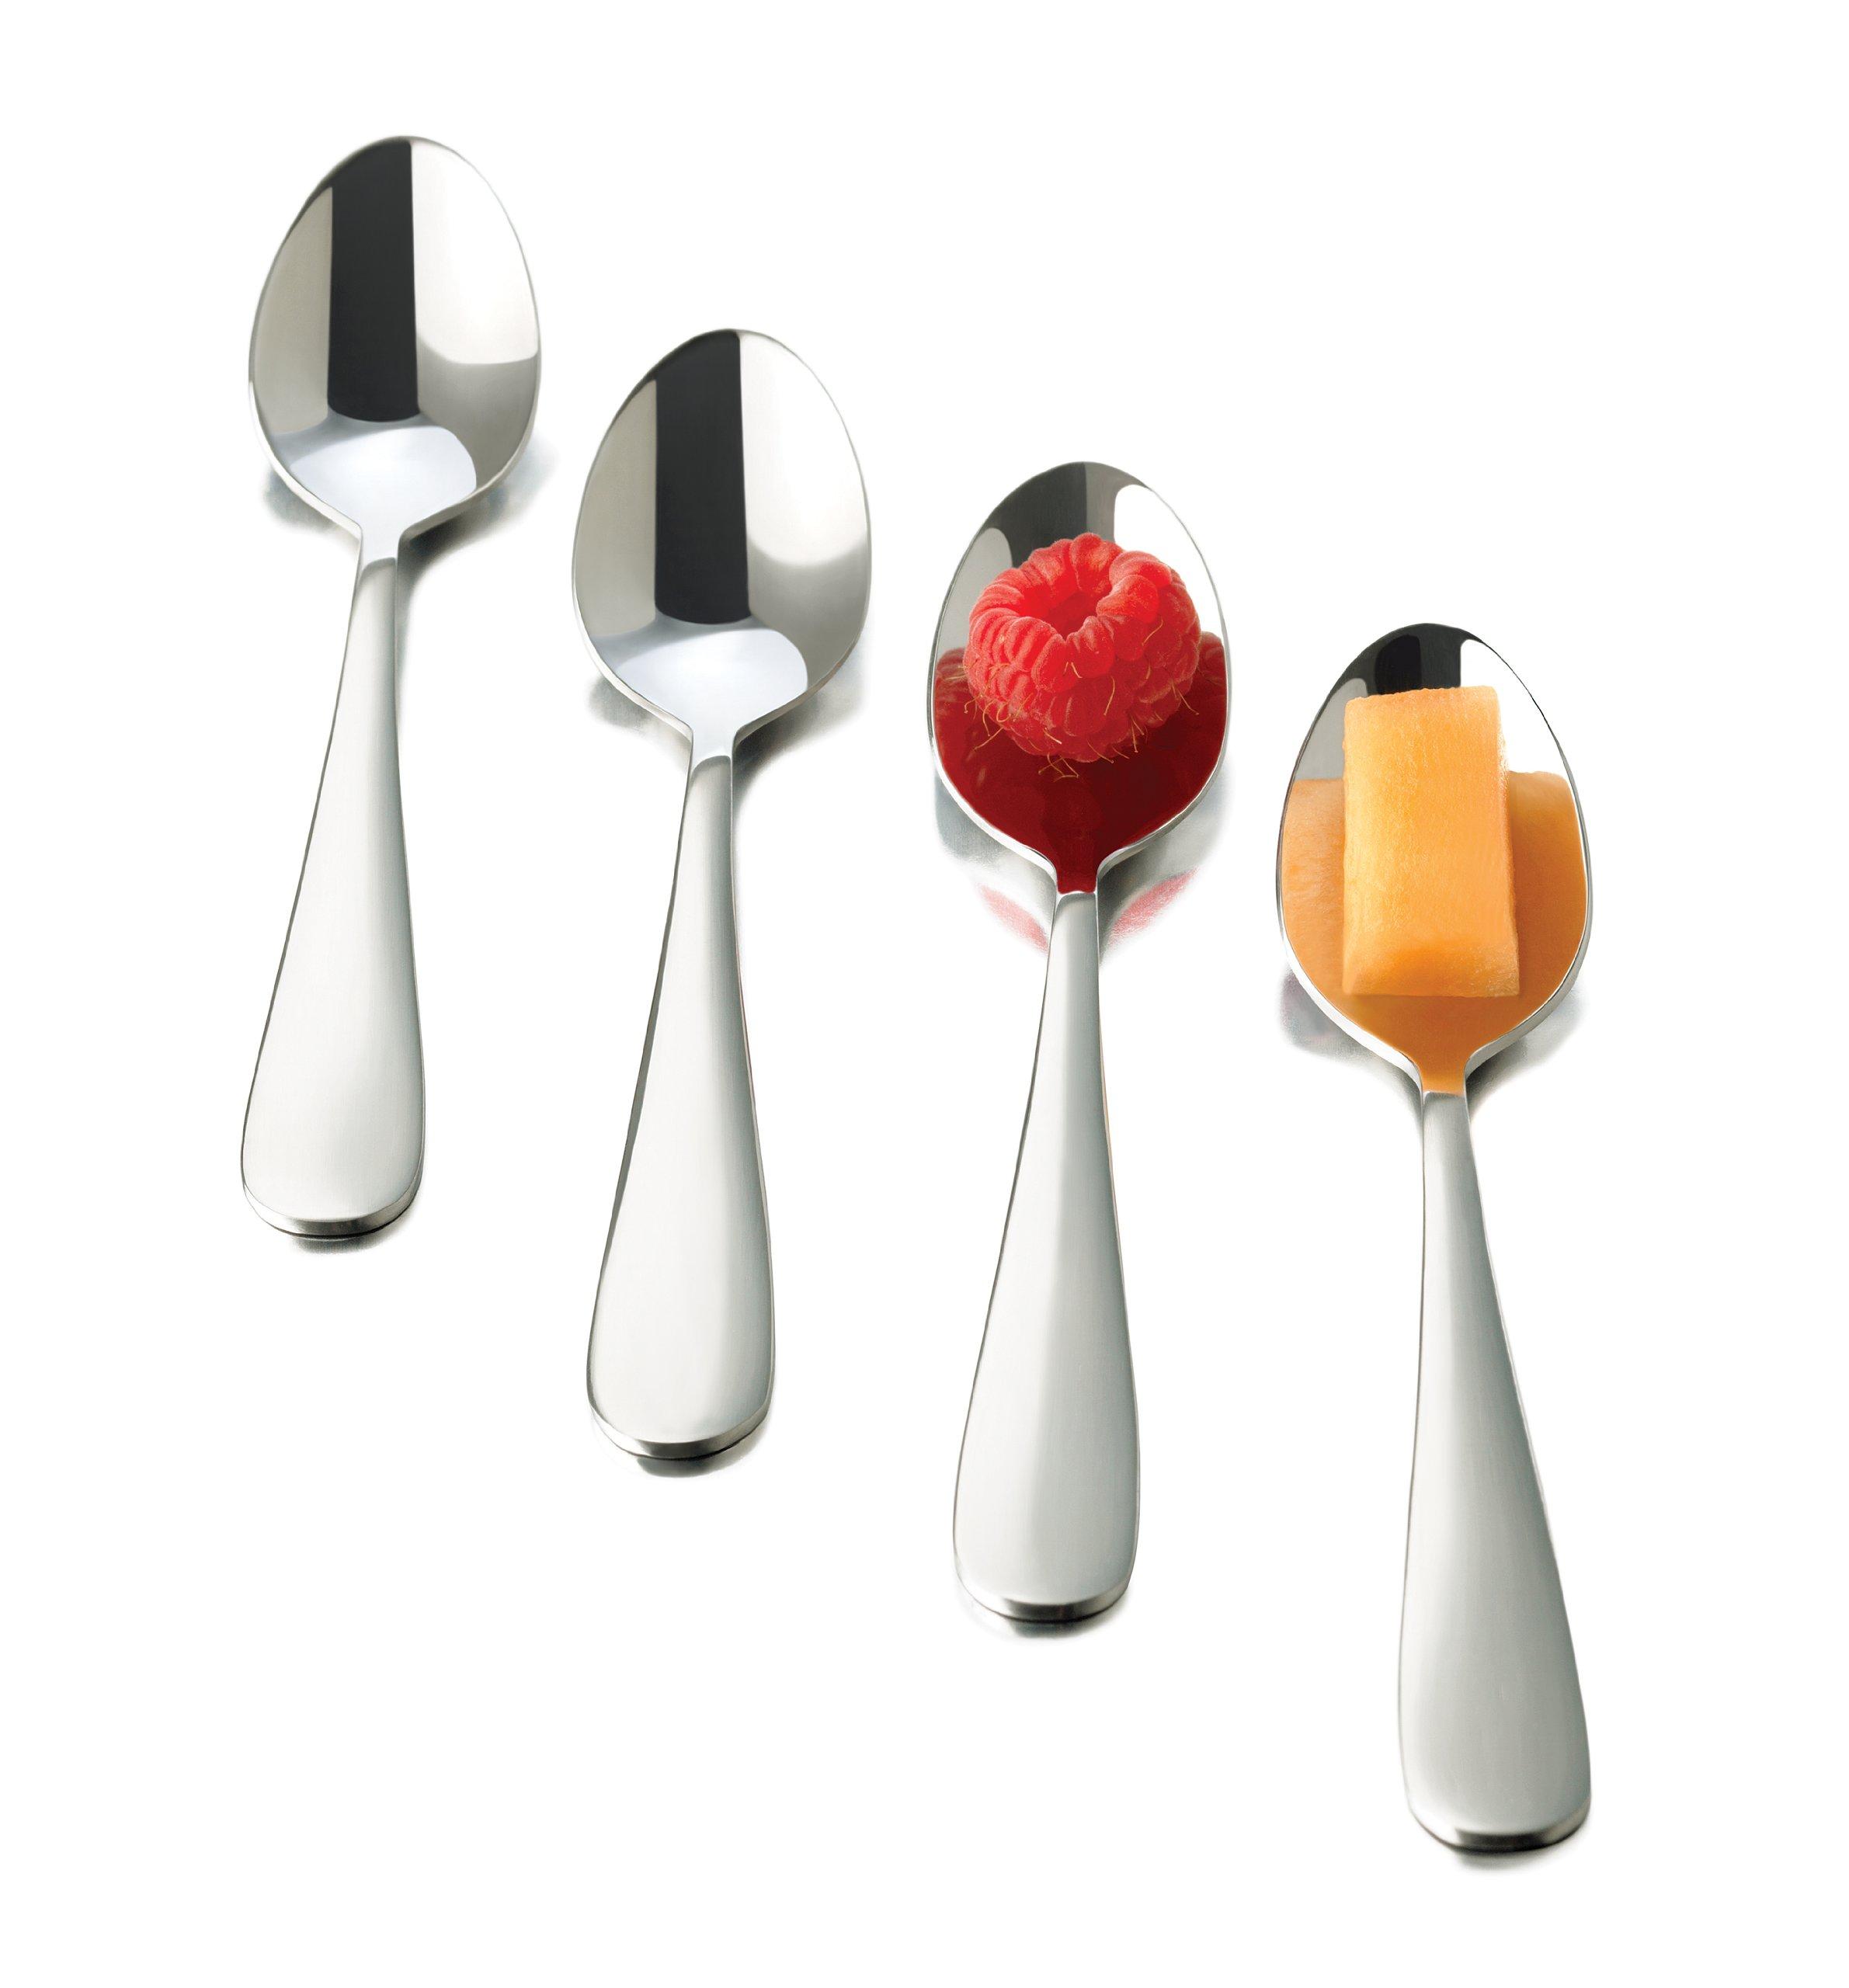 Libbey Just Tasting Appetizer Spoon, 12-Piece